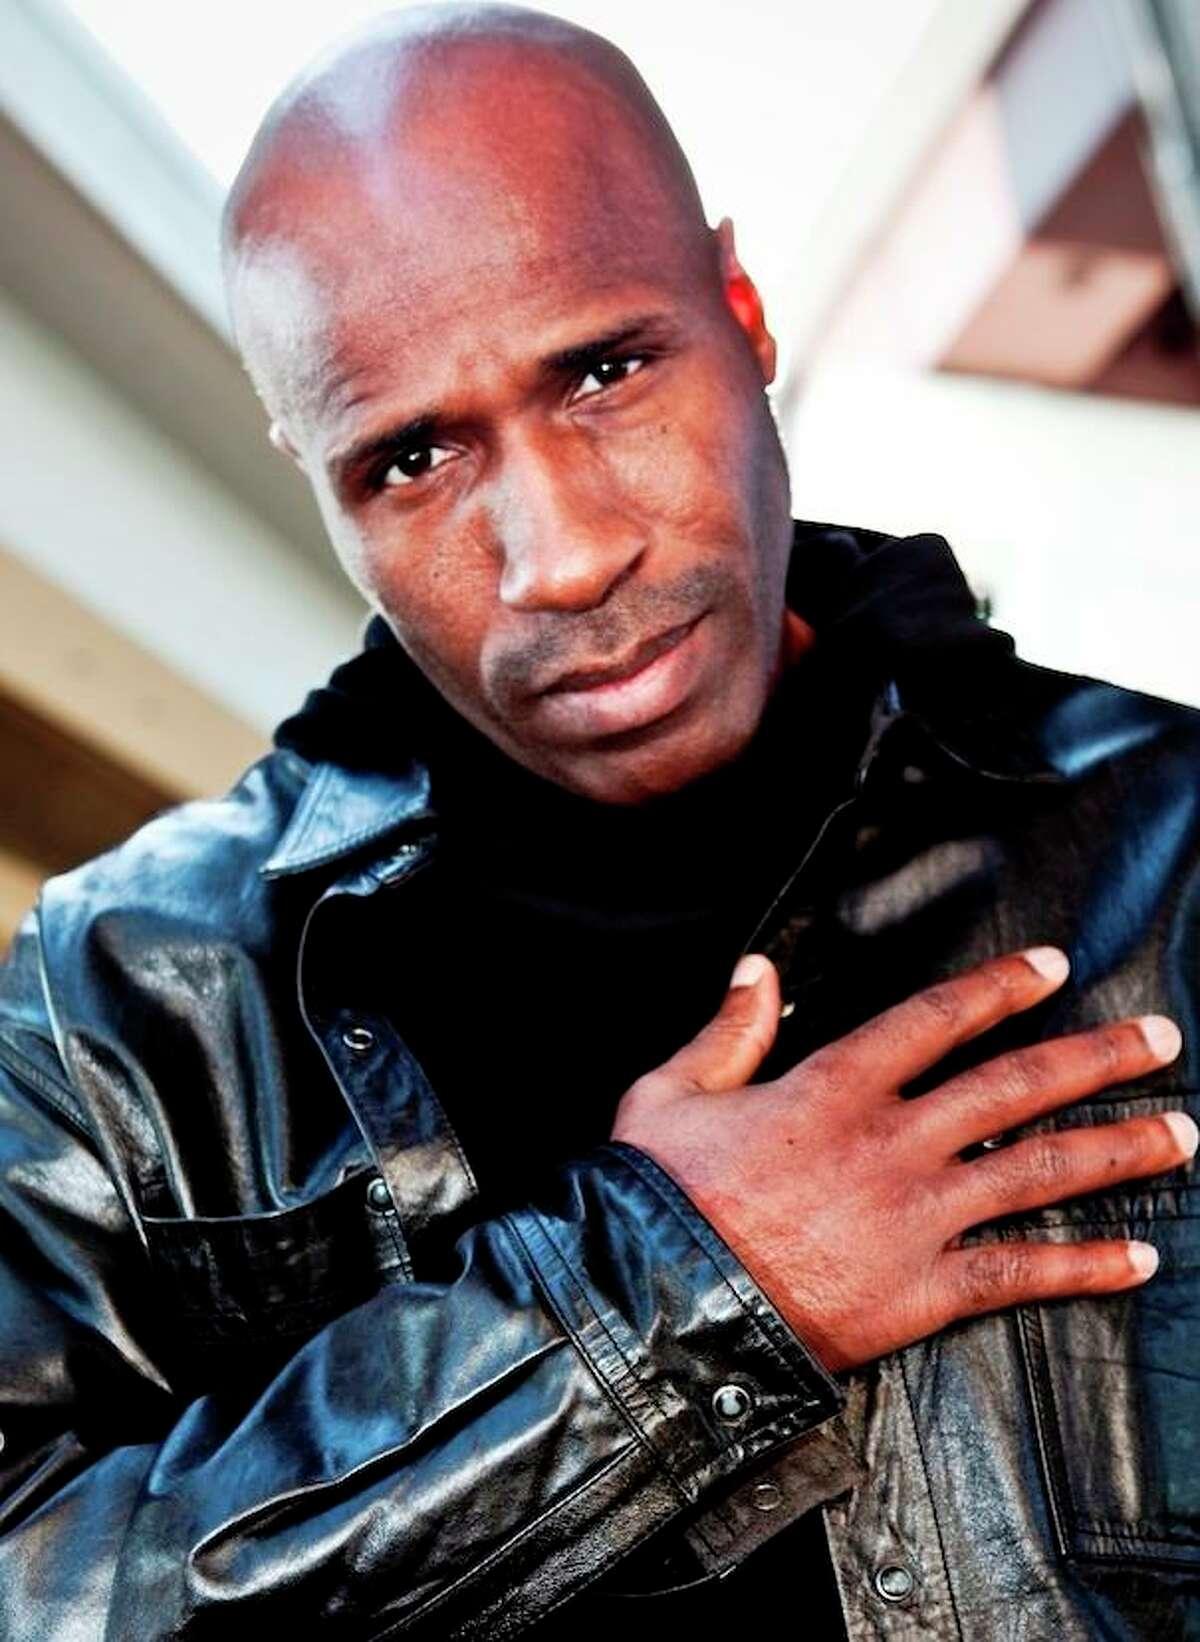 Willie D. of Houston rap group Geto Boys